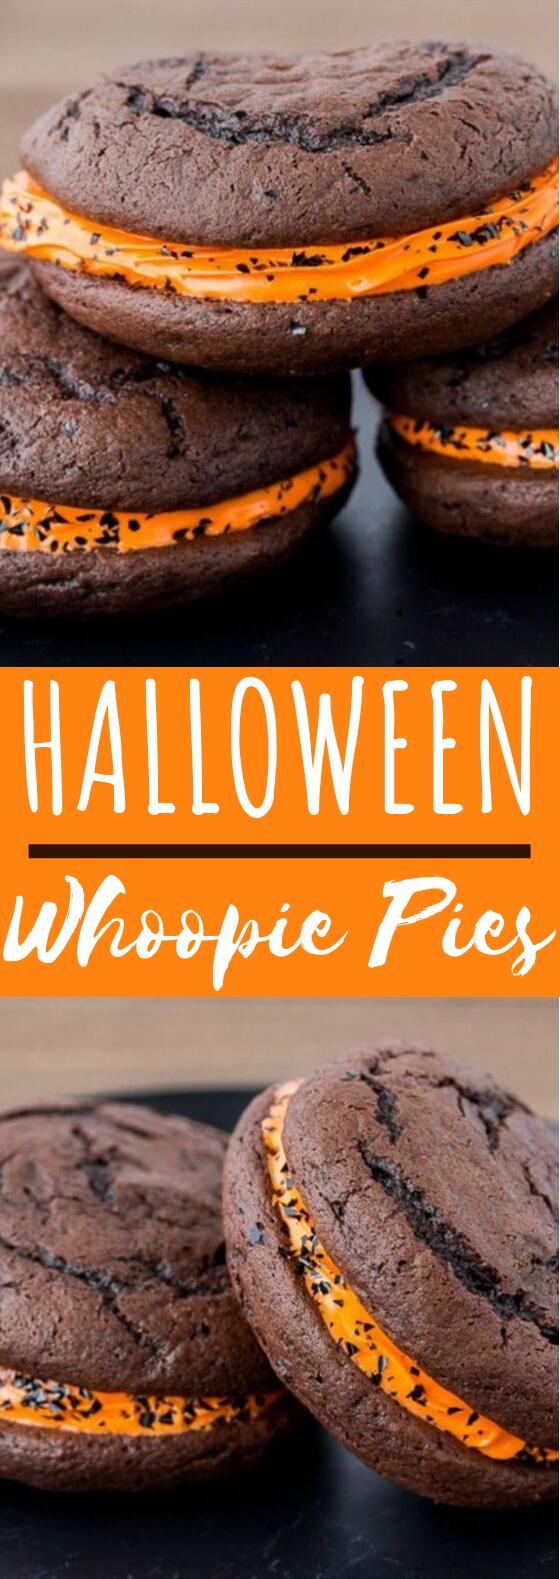 Halloween Whoopie Pies #desserts #cookies